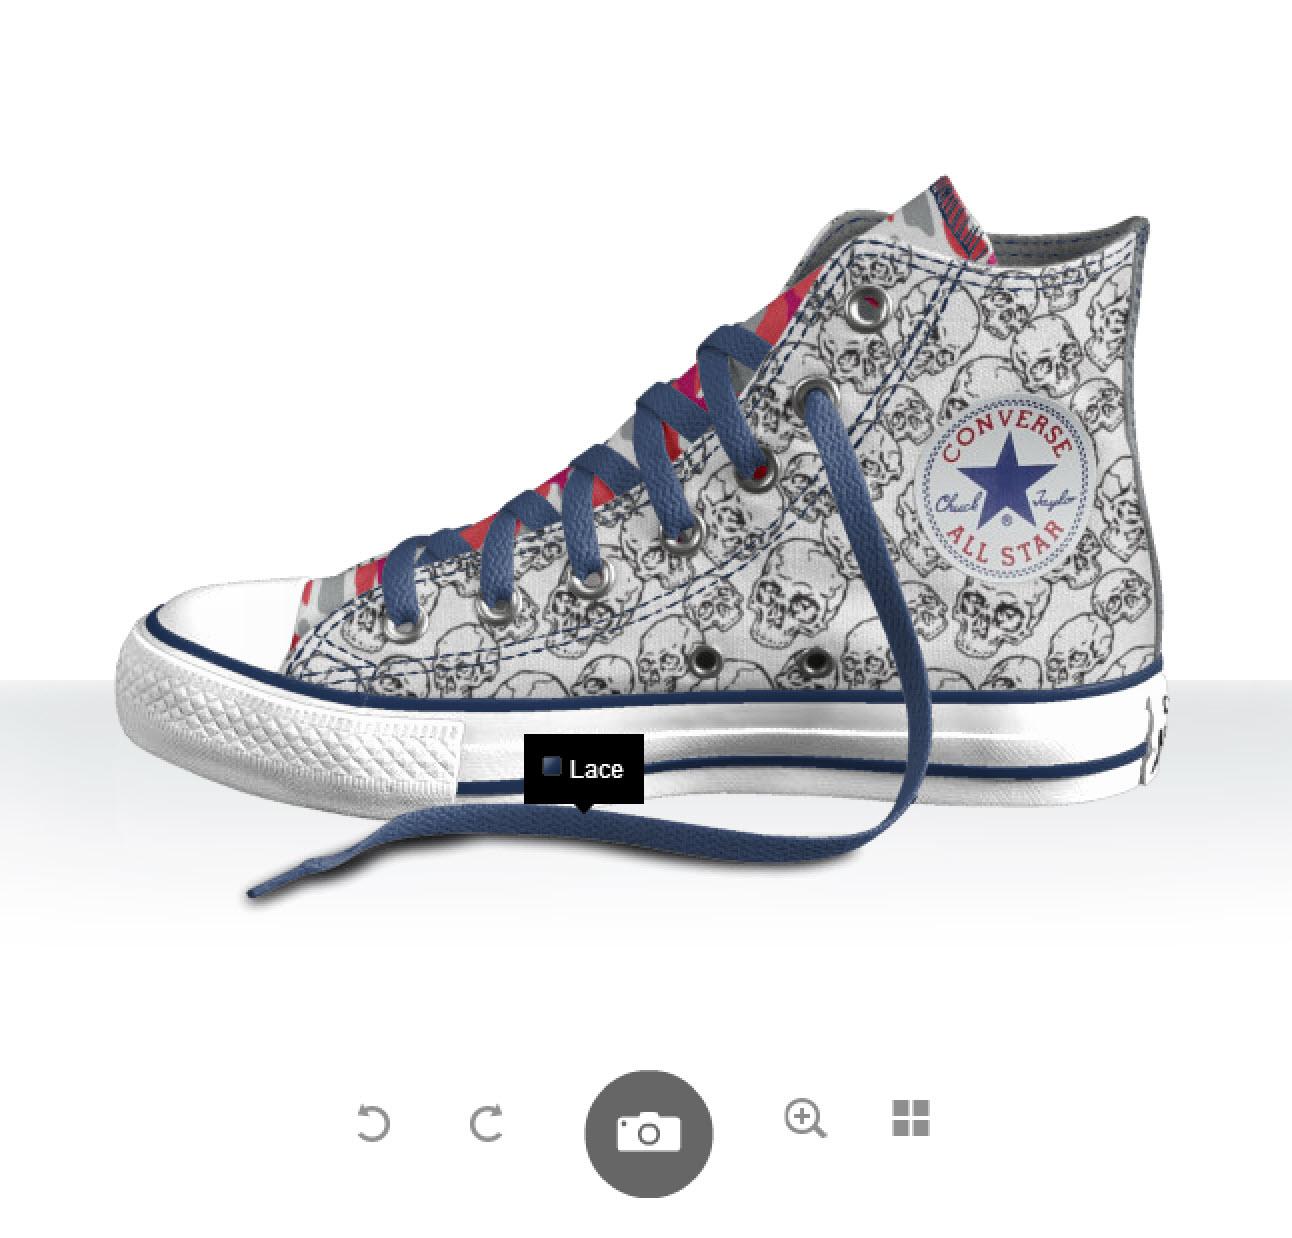 Designa dina egna Converse Sverige, dödskalle-look - I love it!